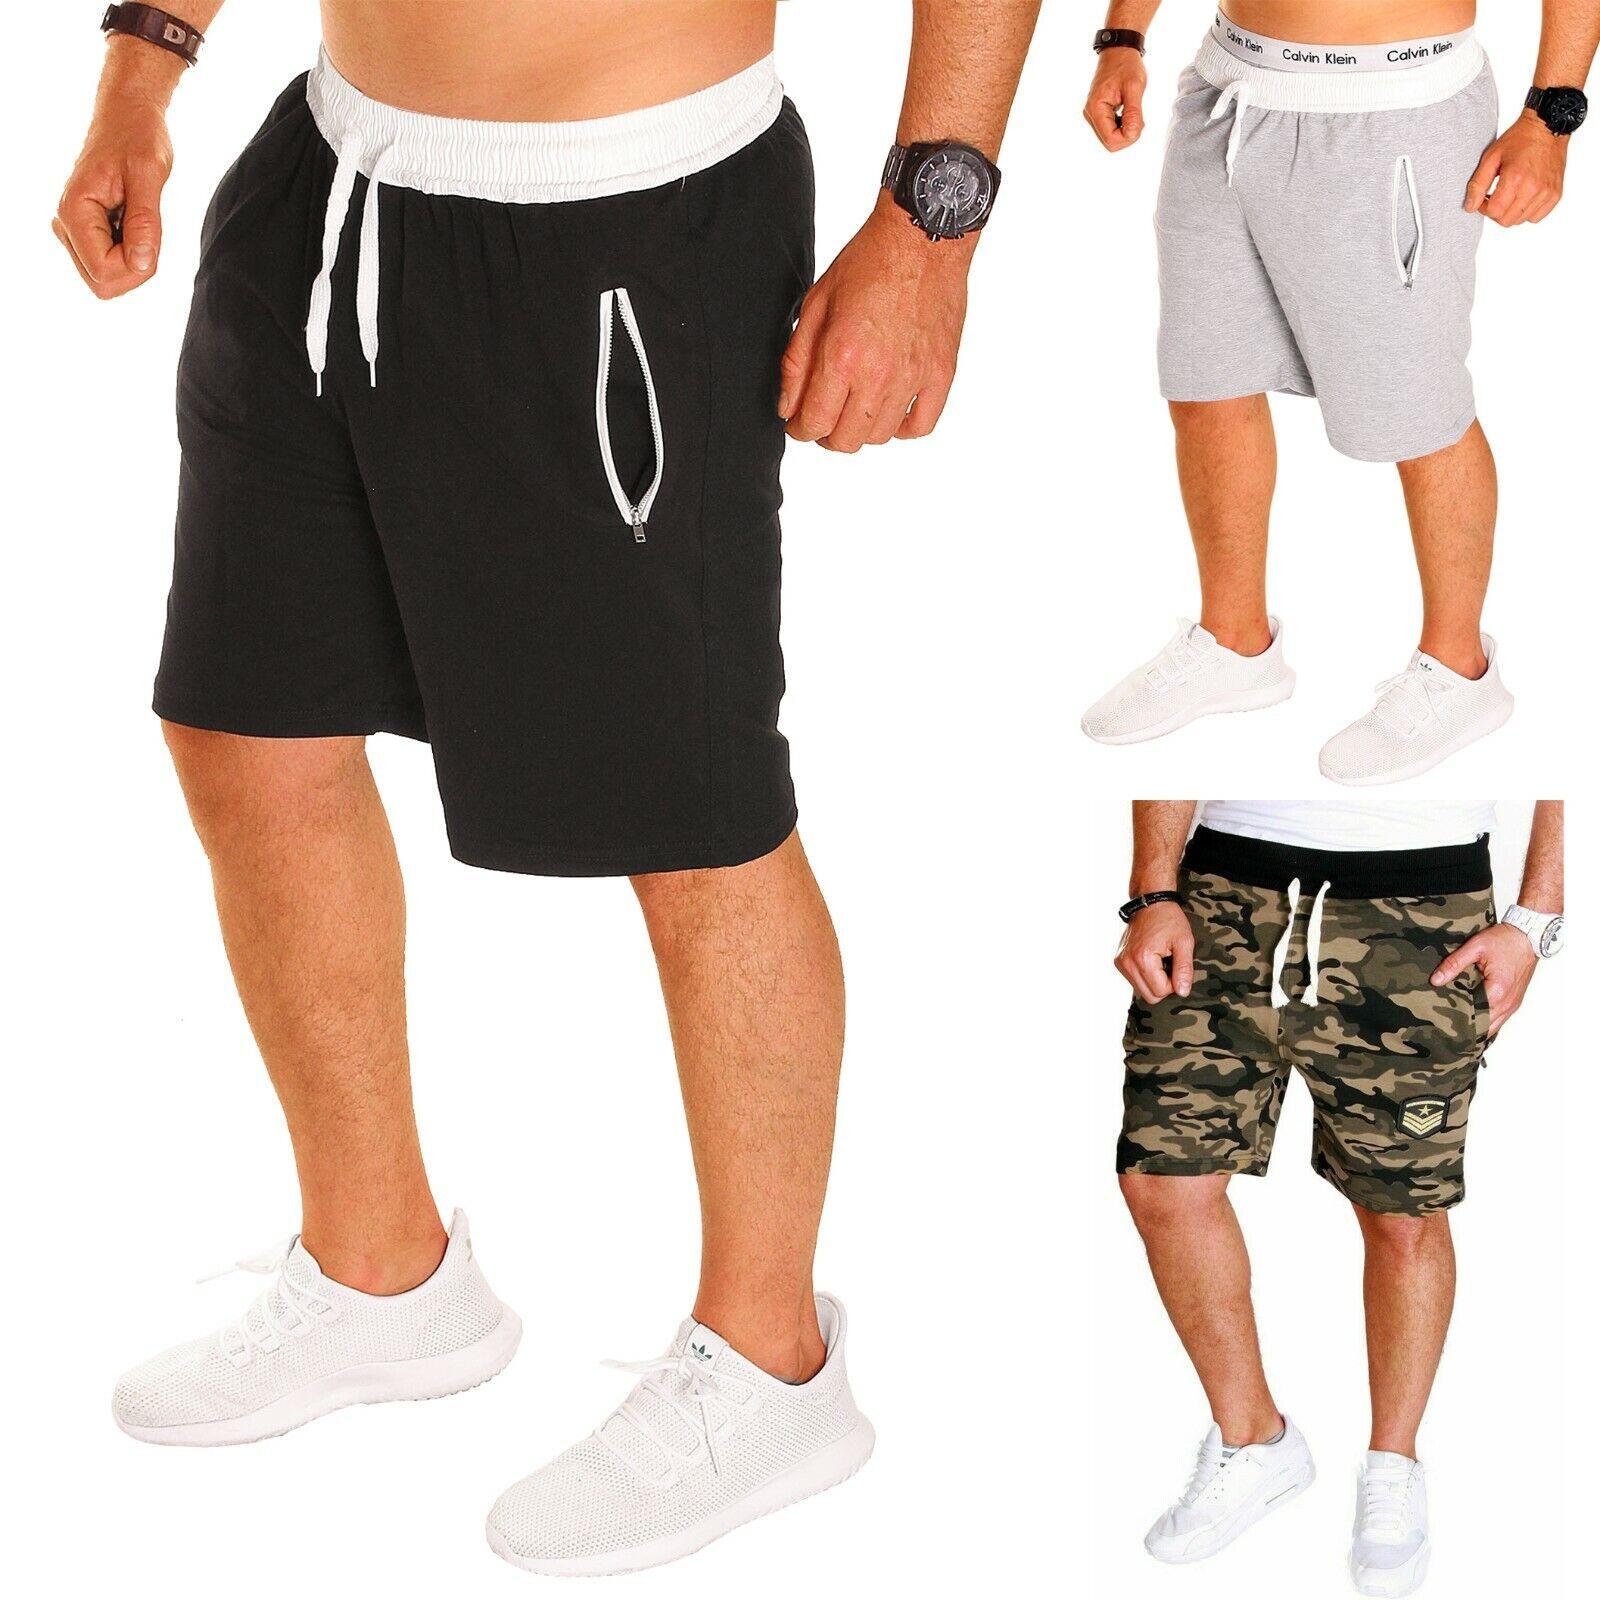 Herren Short shorts shorty sport Baumwolle Capri Hose kurz Sommer uni Neu B.333